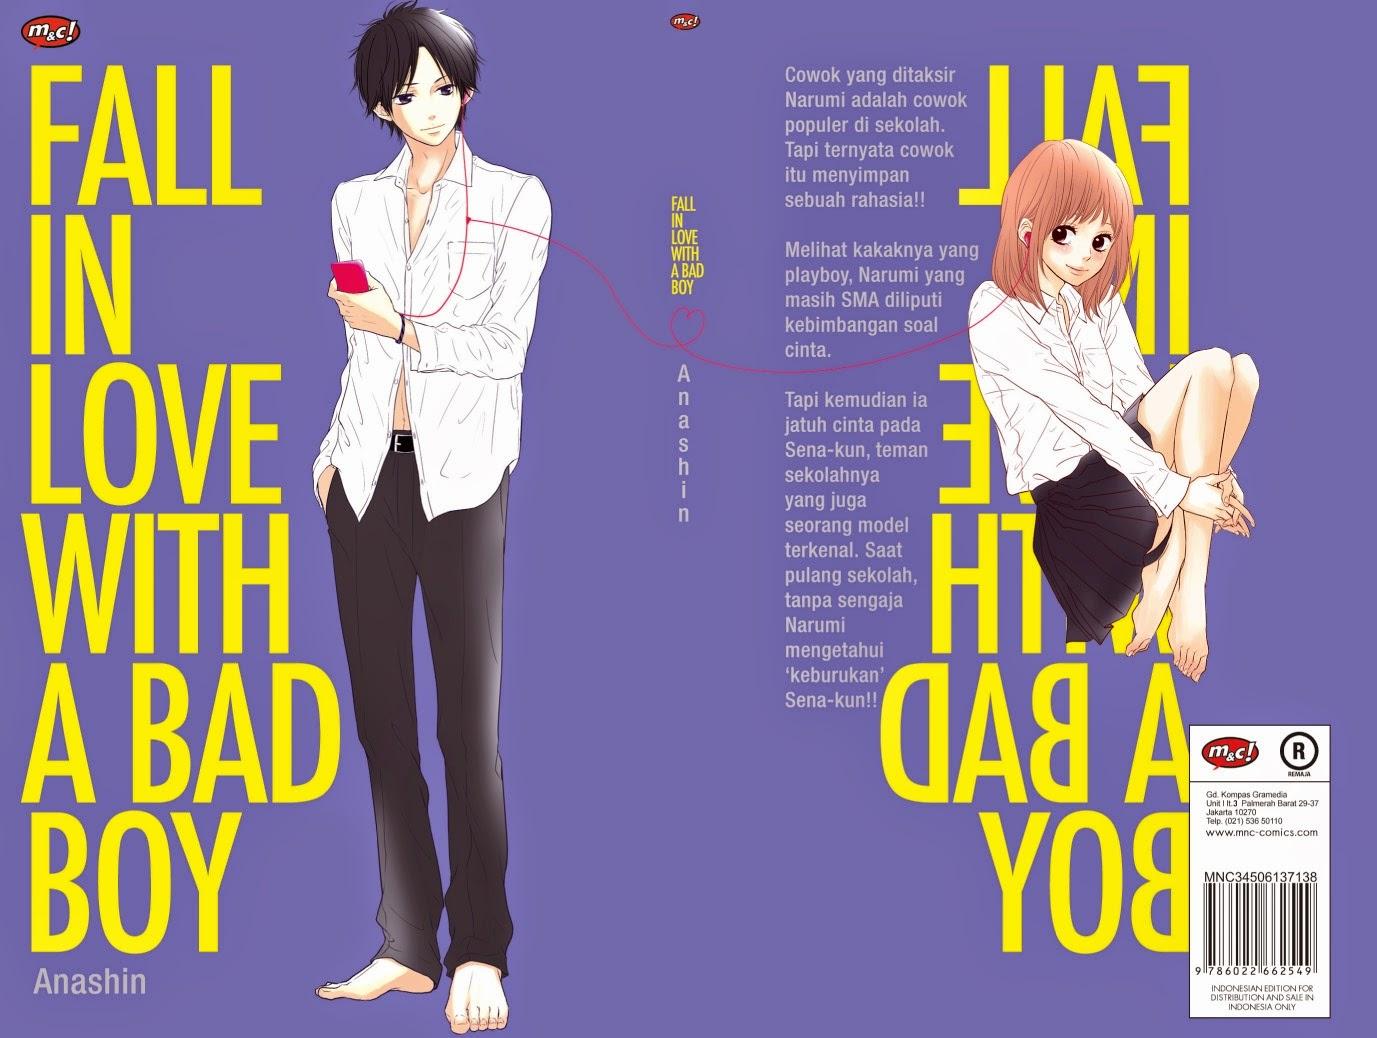 Anime Daisuki: Sinopsis Fall In Love With a Bad Boy (Manga)